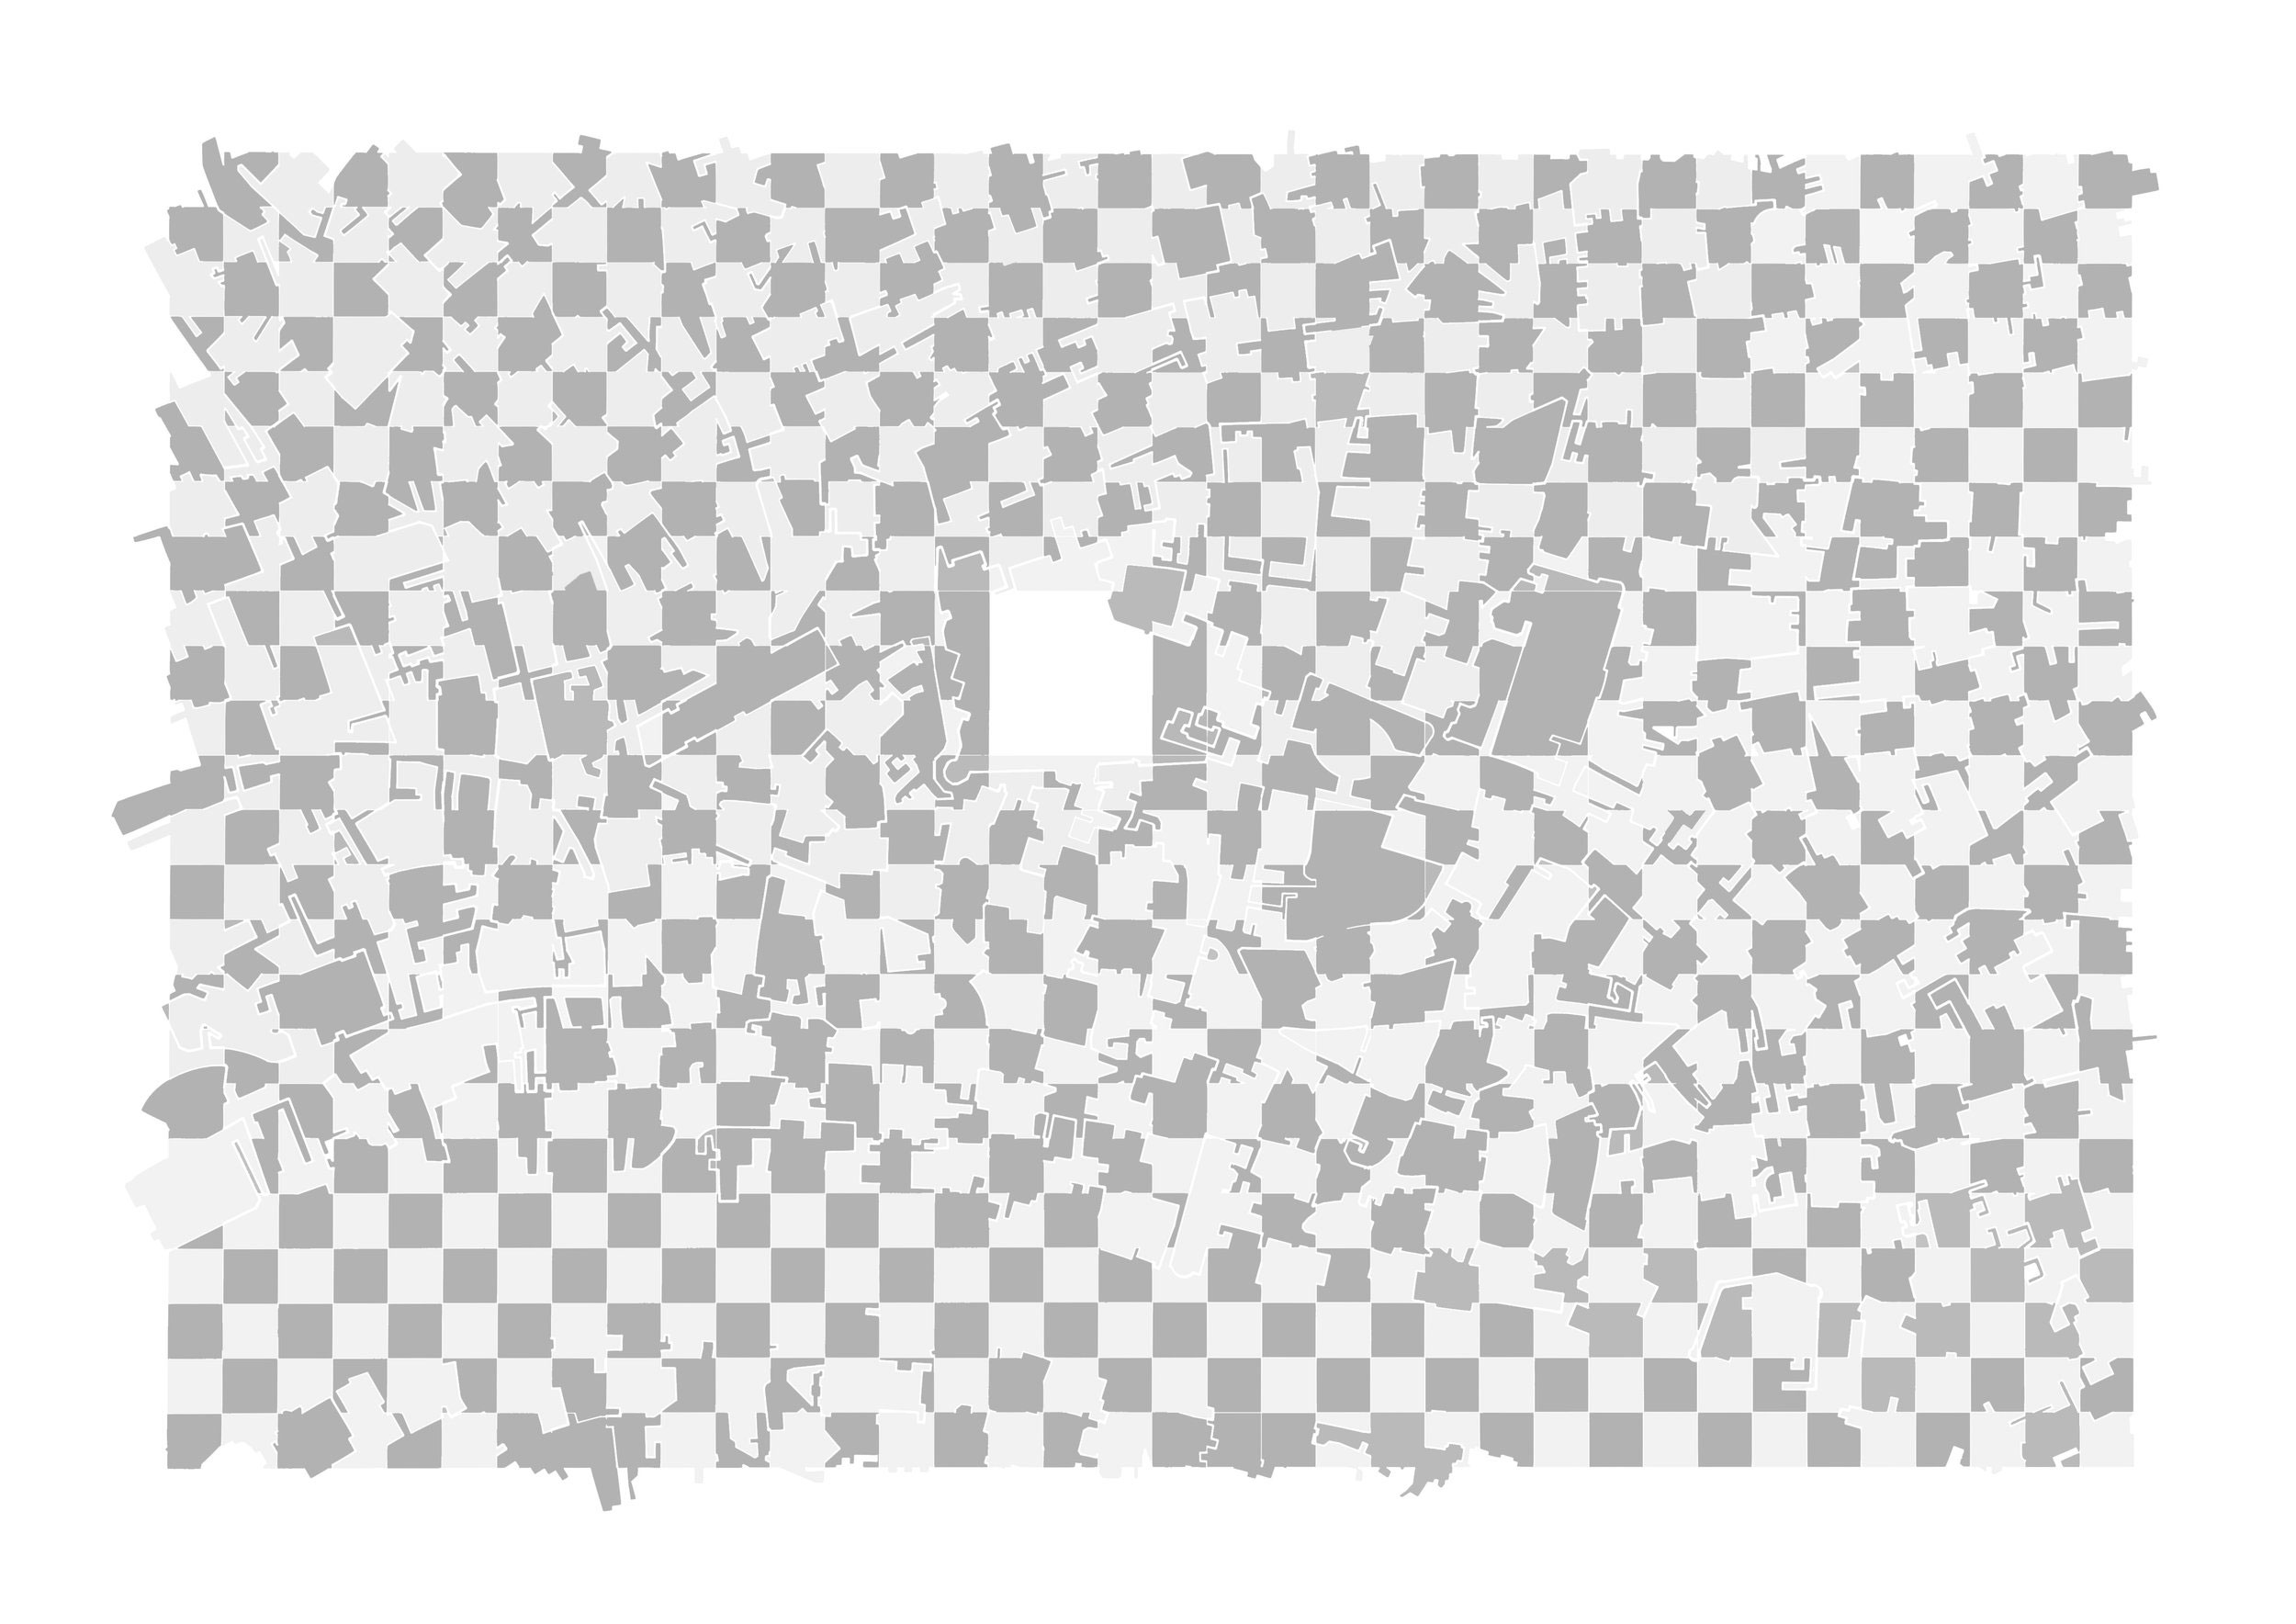 City Of Blocks 1 (2017) - 841 x 594mm, digitally processed hand drawing